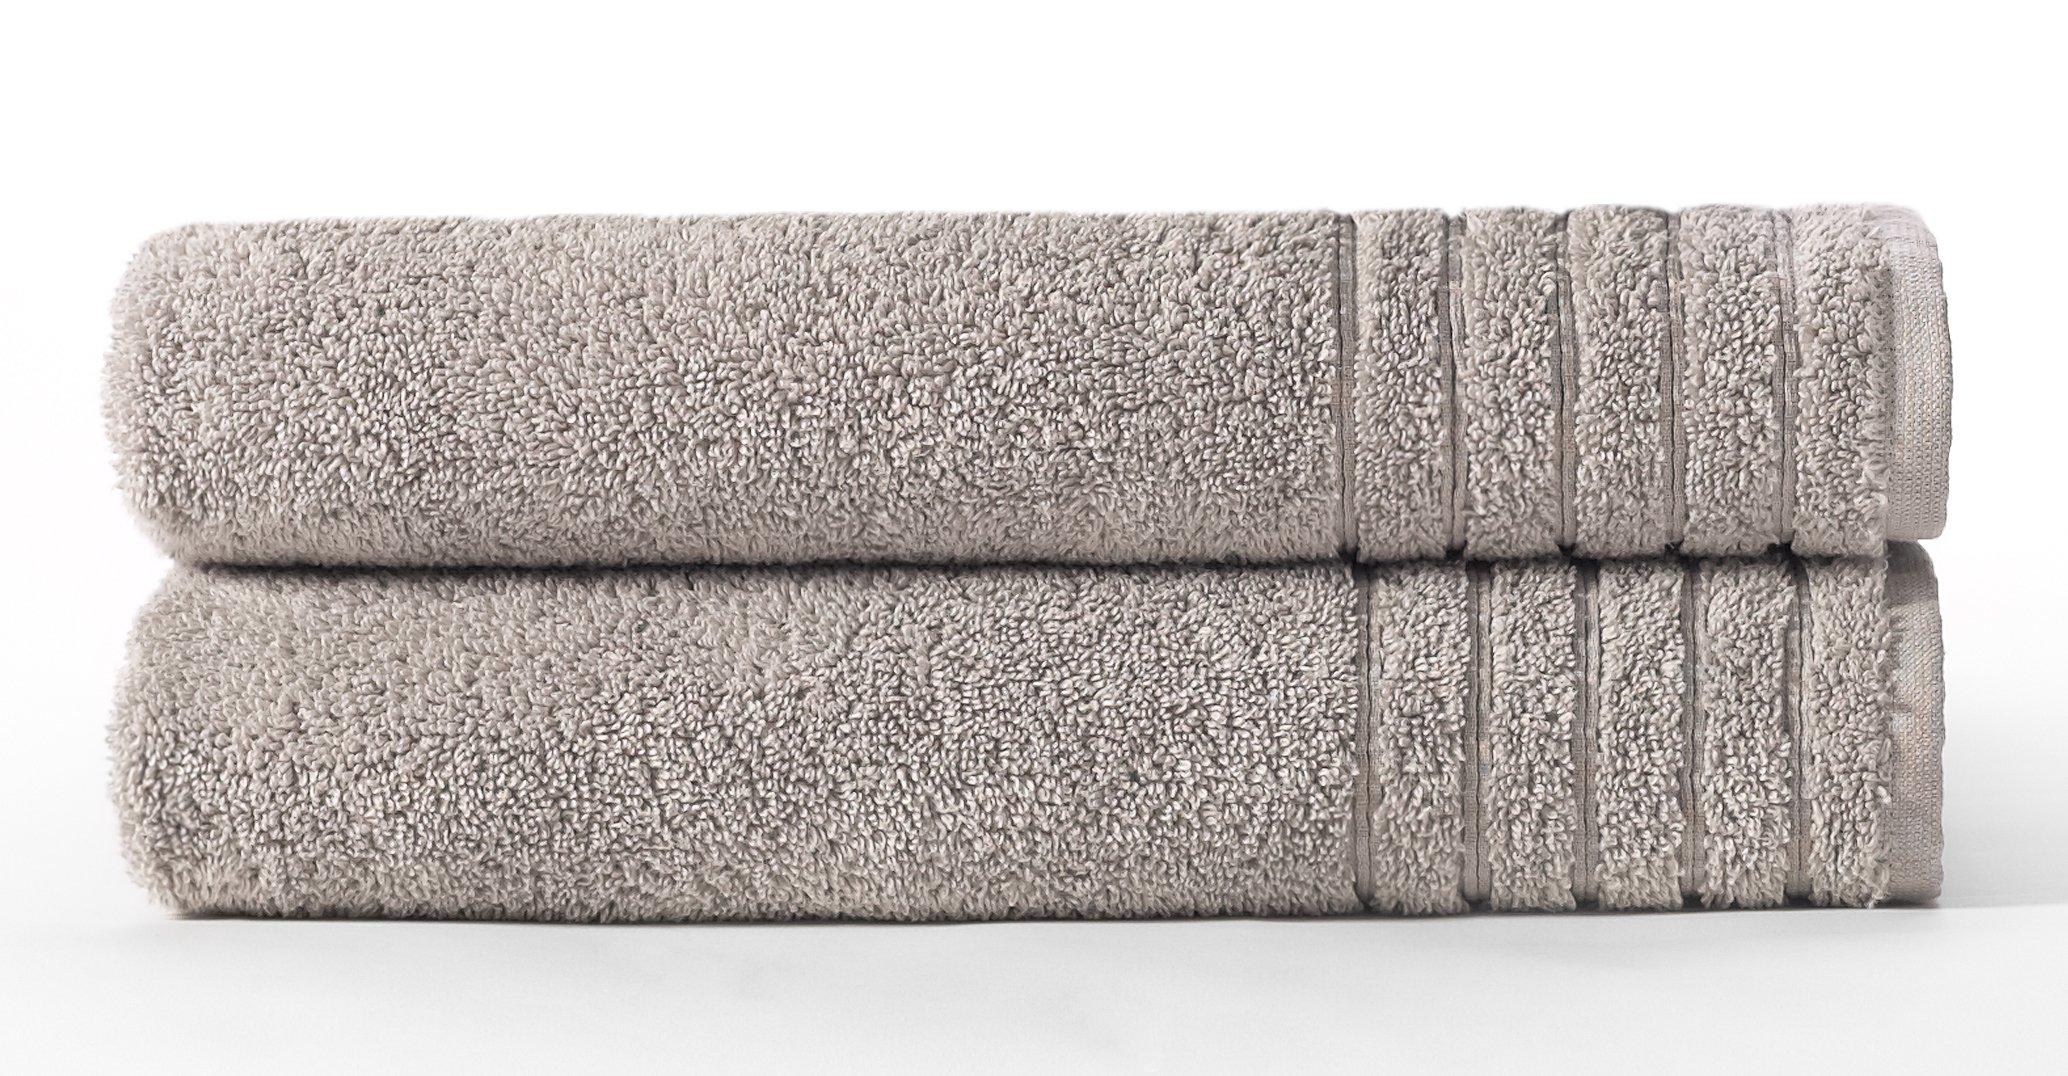 Cotton Craft - Super Zero Twist 2 Piece Oversized Bath Sheet Set 35x70 - Mercury - 7 Star Hotel Collection Beyond Luxury Softer Than A Cloud - 100% Pure Super Zero Twist Cotton